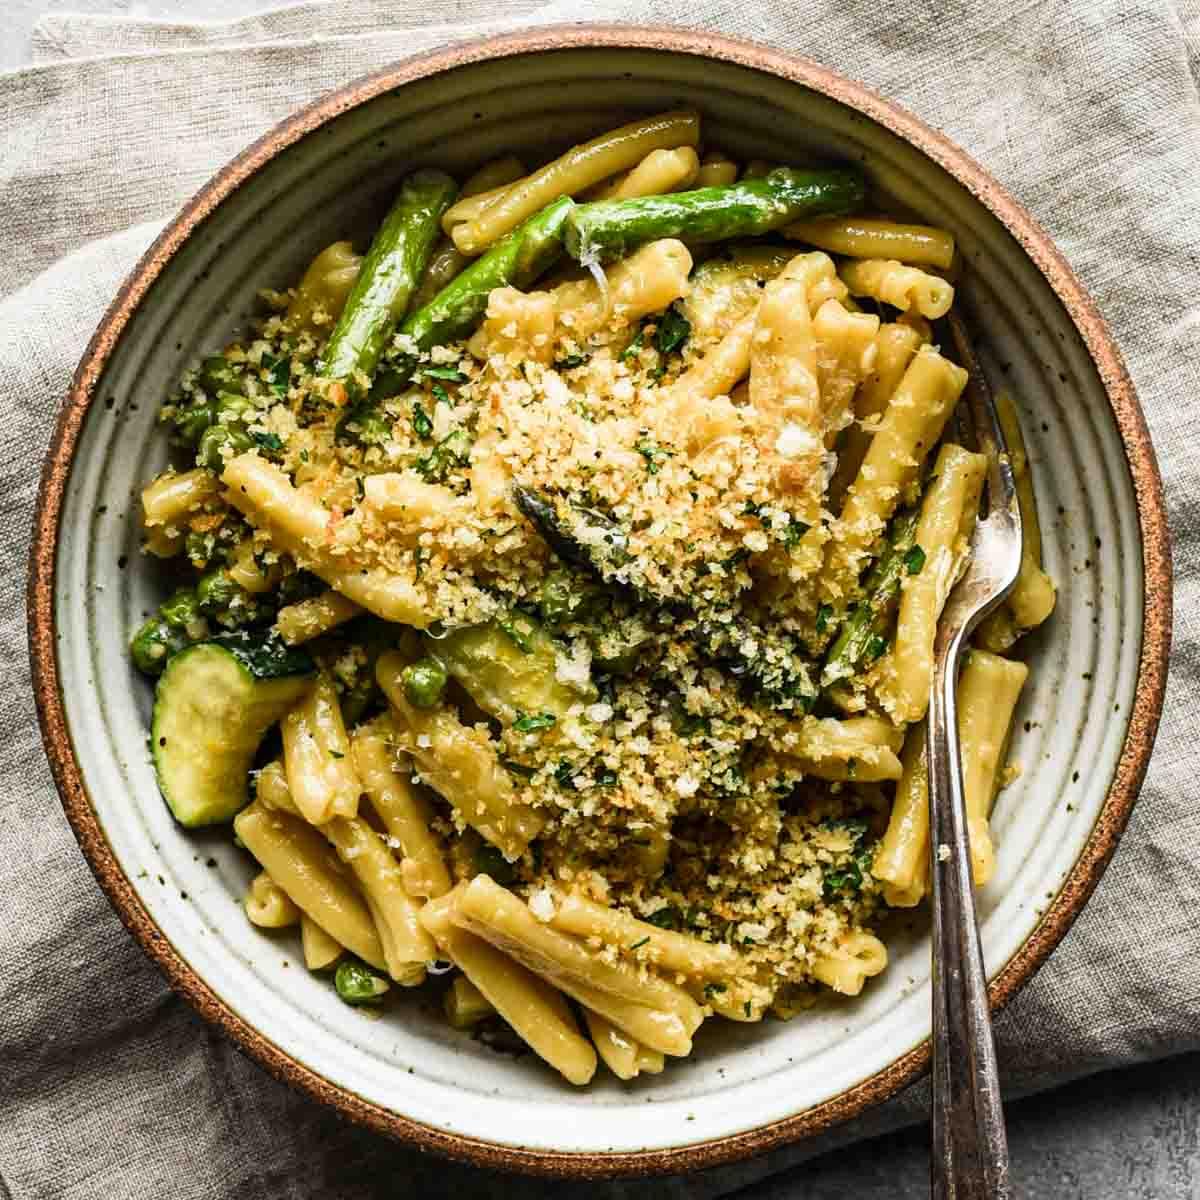 Creamy Spring Pasta In A Bowl